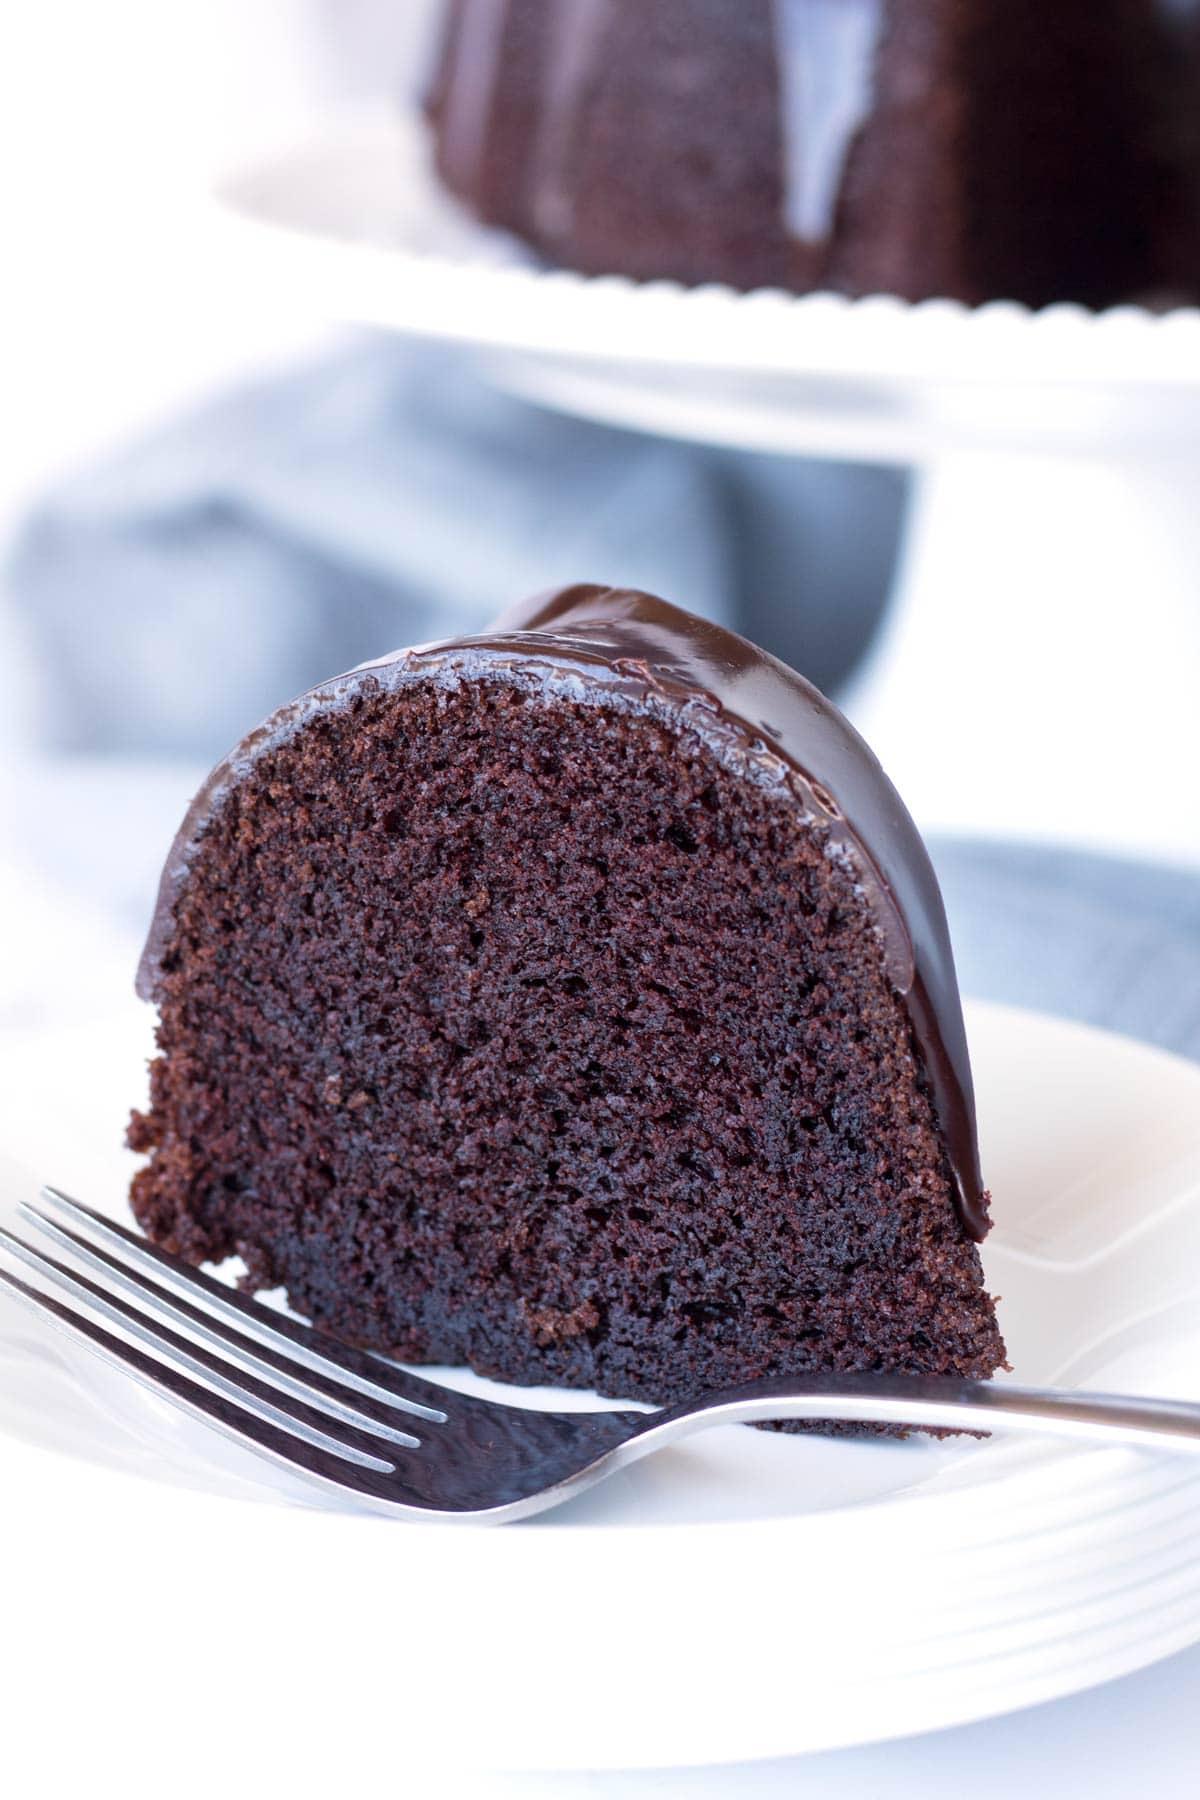 Extra moist chocolate Bundt cake with chocolate ganache on a plate.